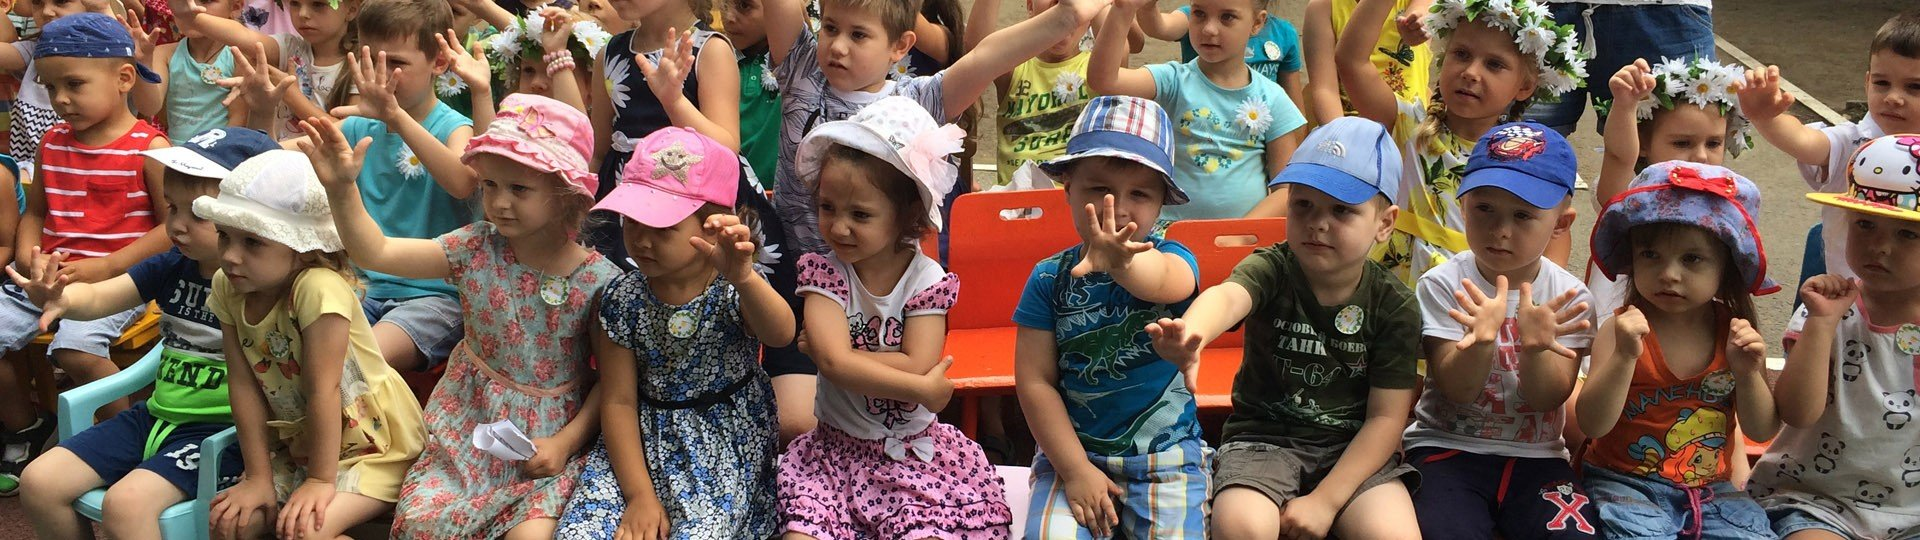 Центр развития ребенка - детский сад №7